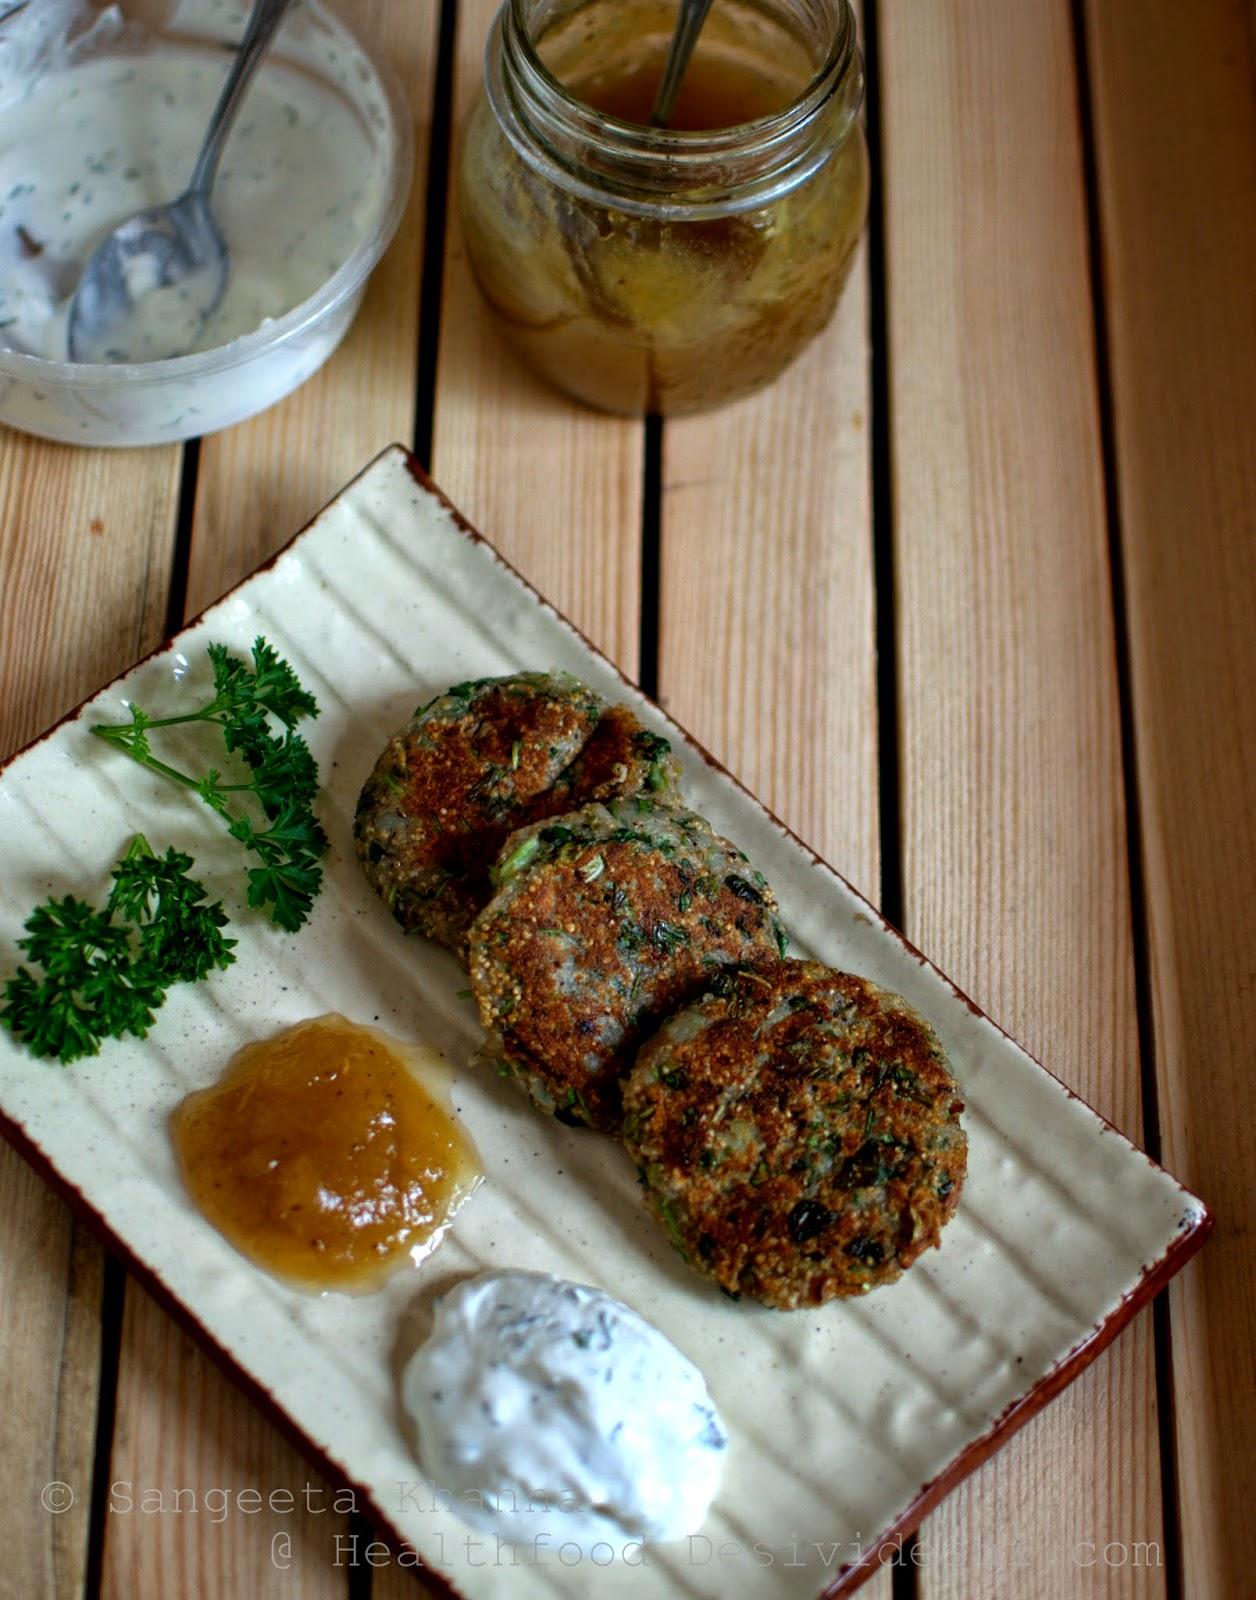 popped amaranth potato walnut savoury cakes or ramdane alu ki tikki | more ways to include amaranth for everyday meals